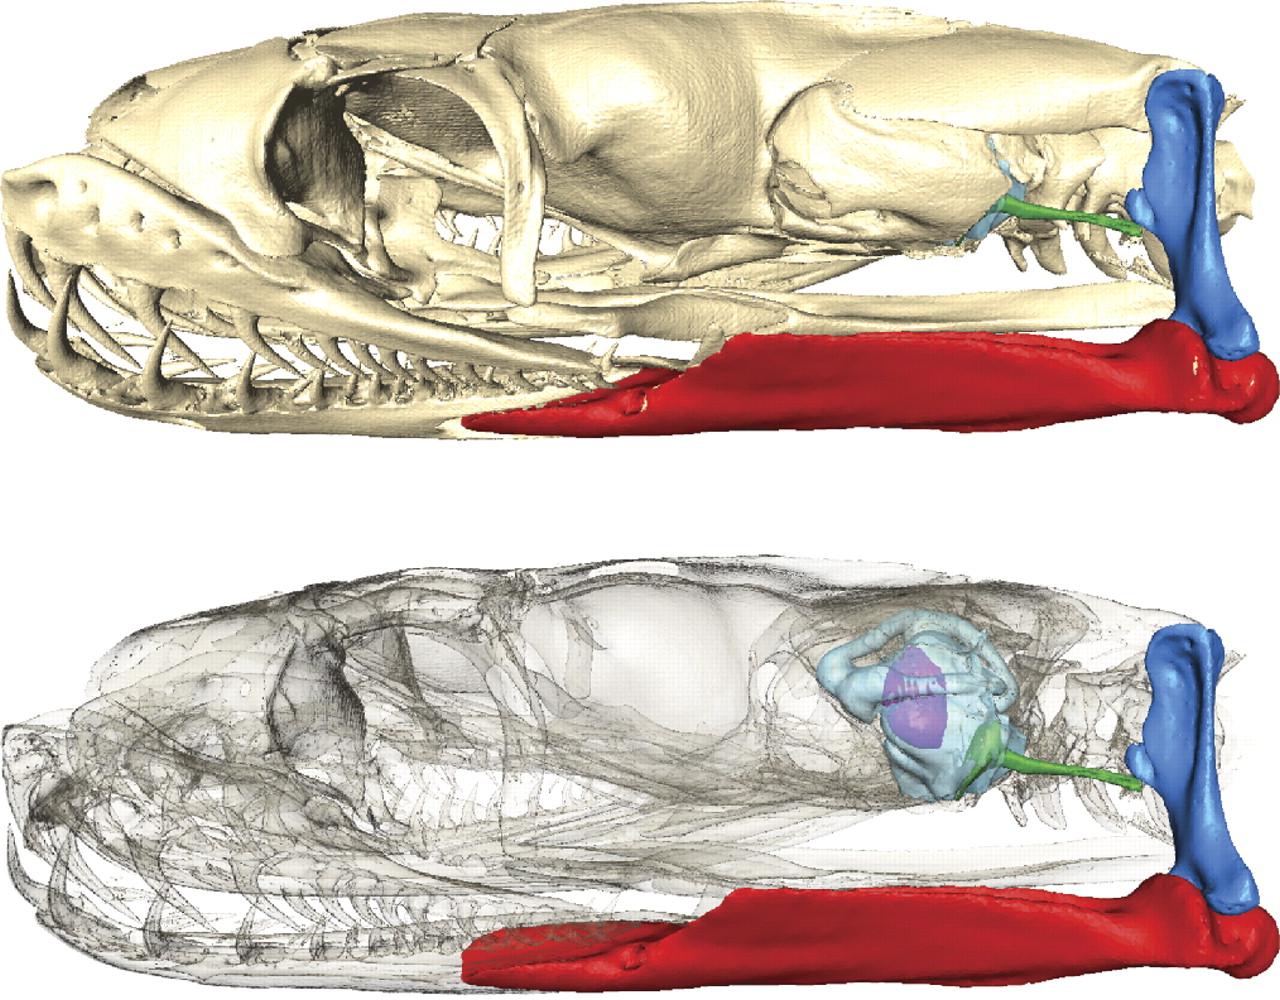 jaw bone of snake.jpg